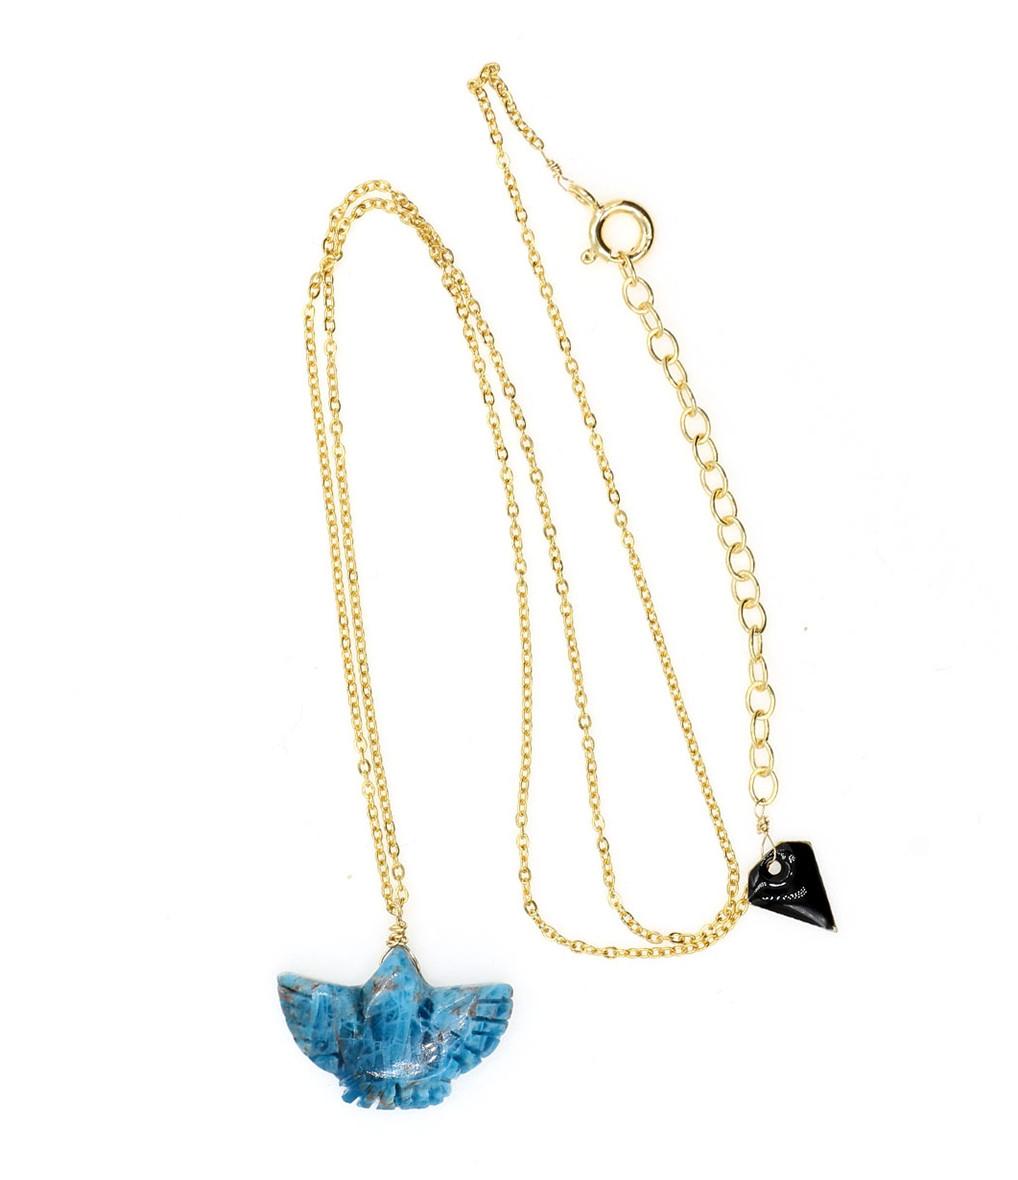 MON PRECIEUX GEM - Collier Condor Apatite Bleu